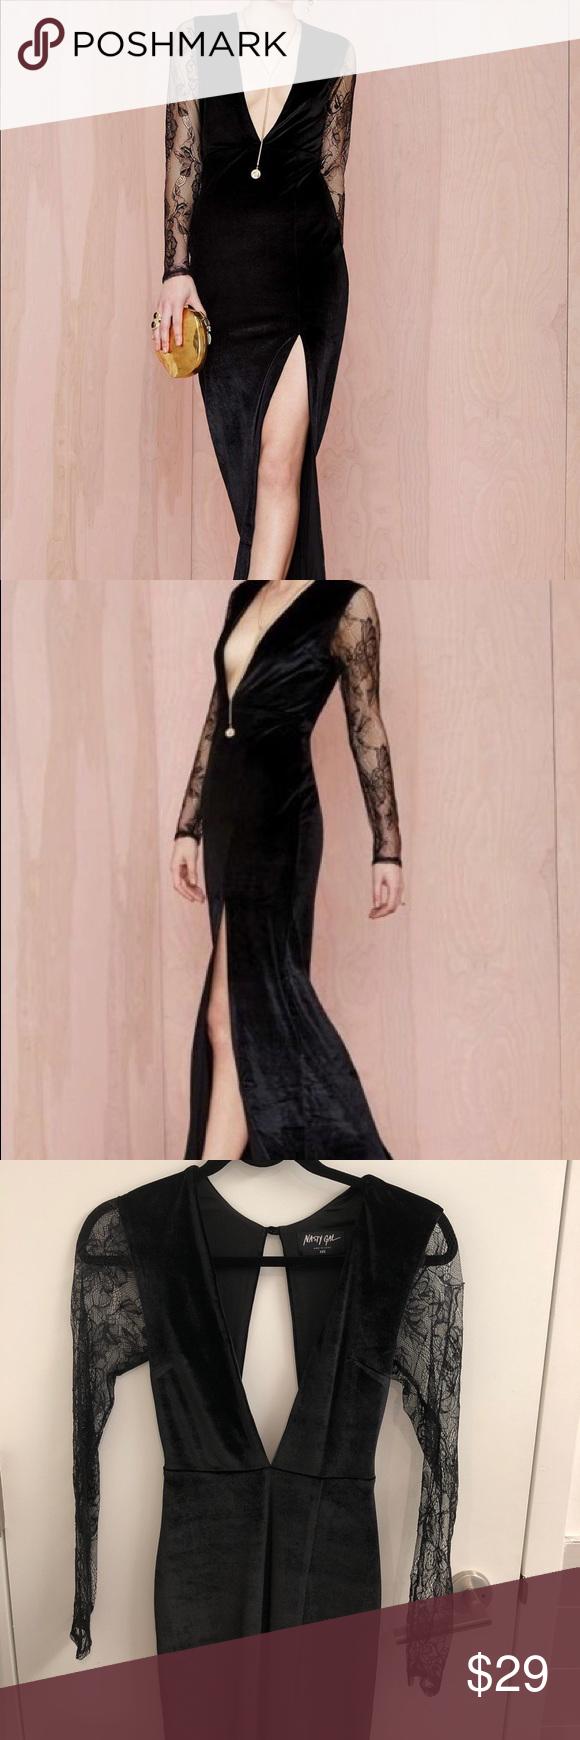 Nasty gal black velvet lace dress size xxs pinterest black